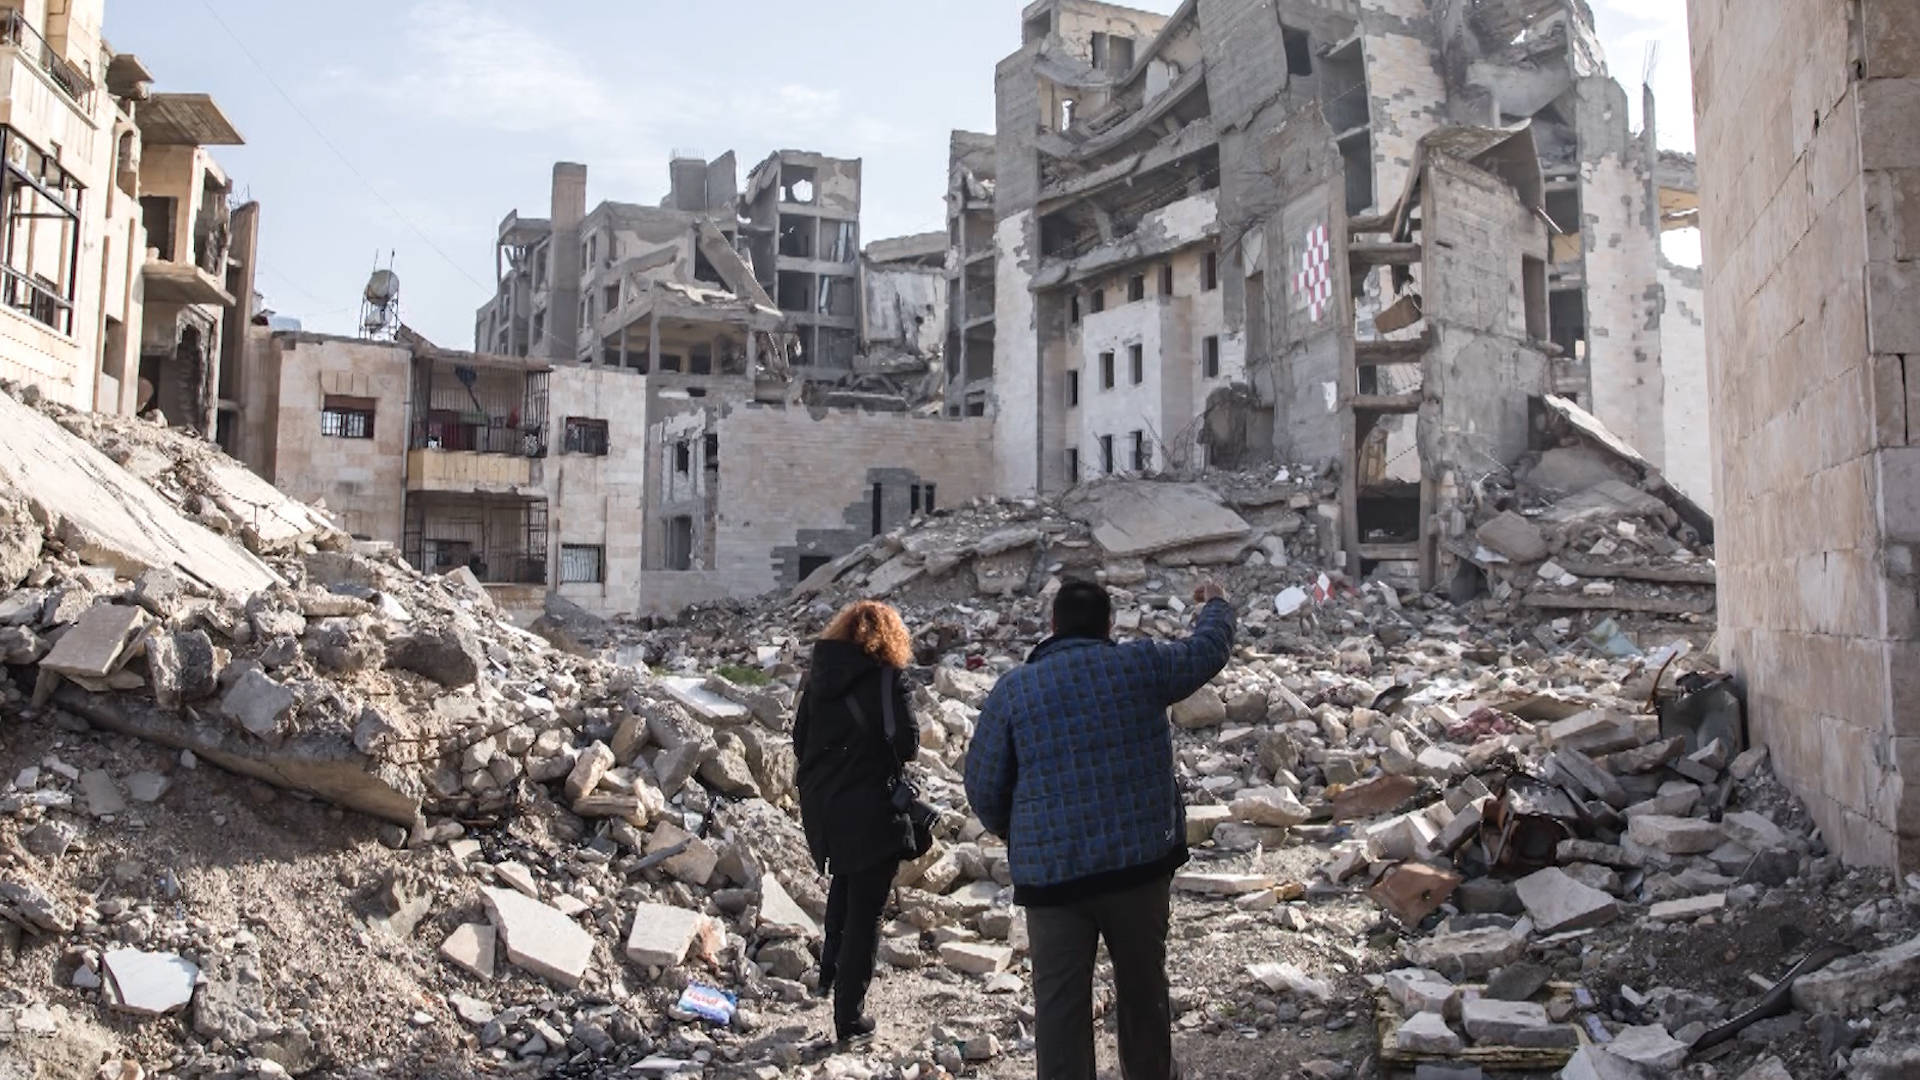 U.S.-Led Coalition Killed 1,600 Syrian Civilians in Raqqa, Syria